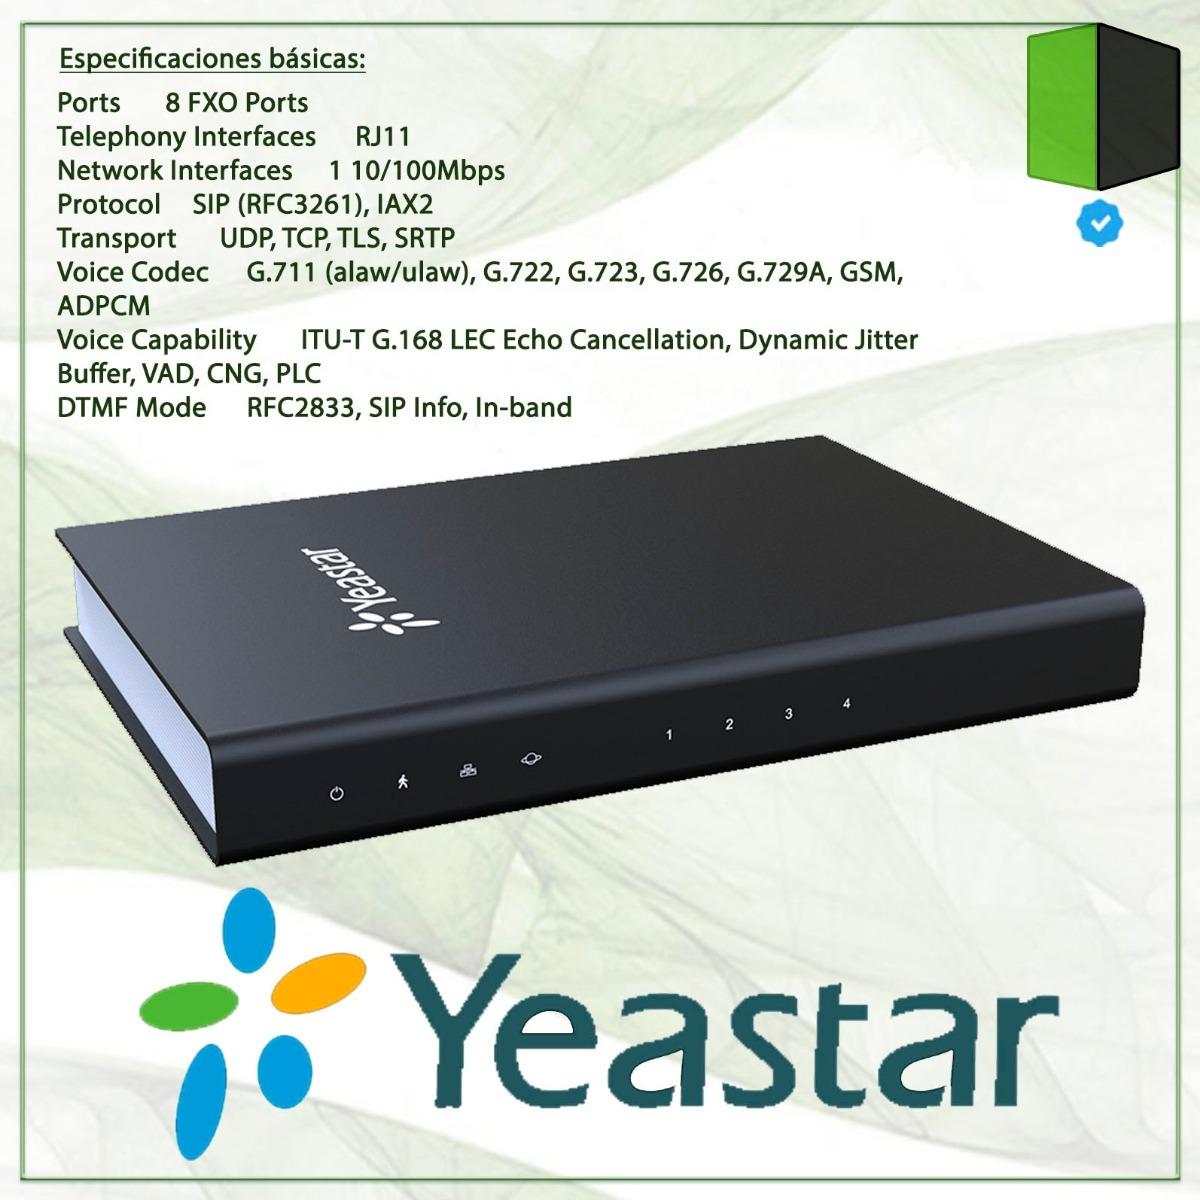 Yeastar 8 port fxo gateway